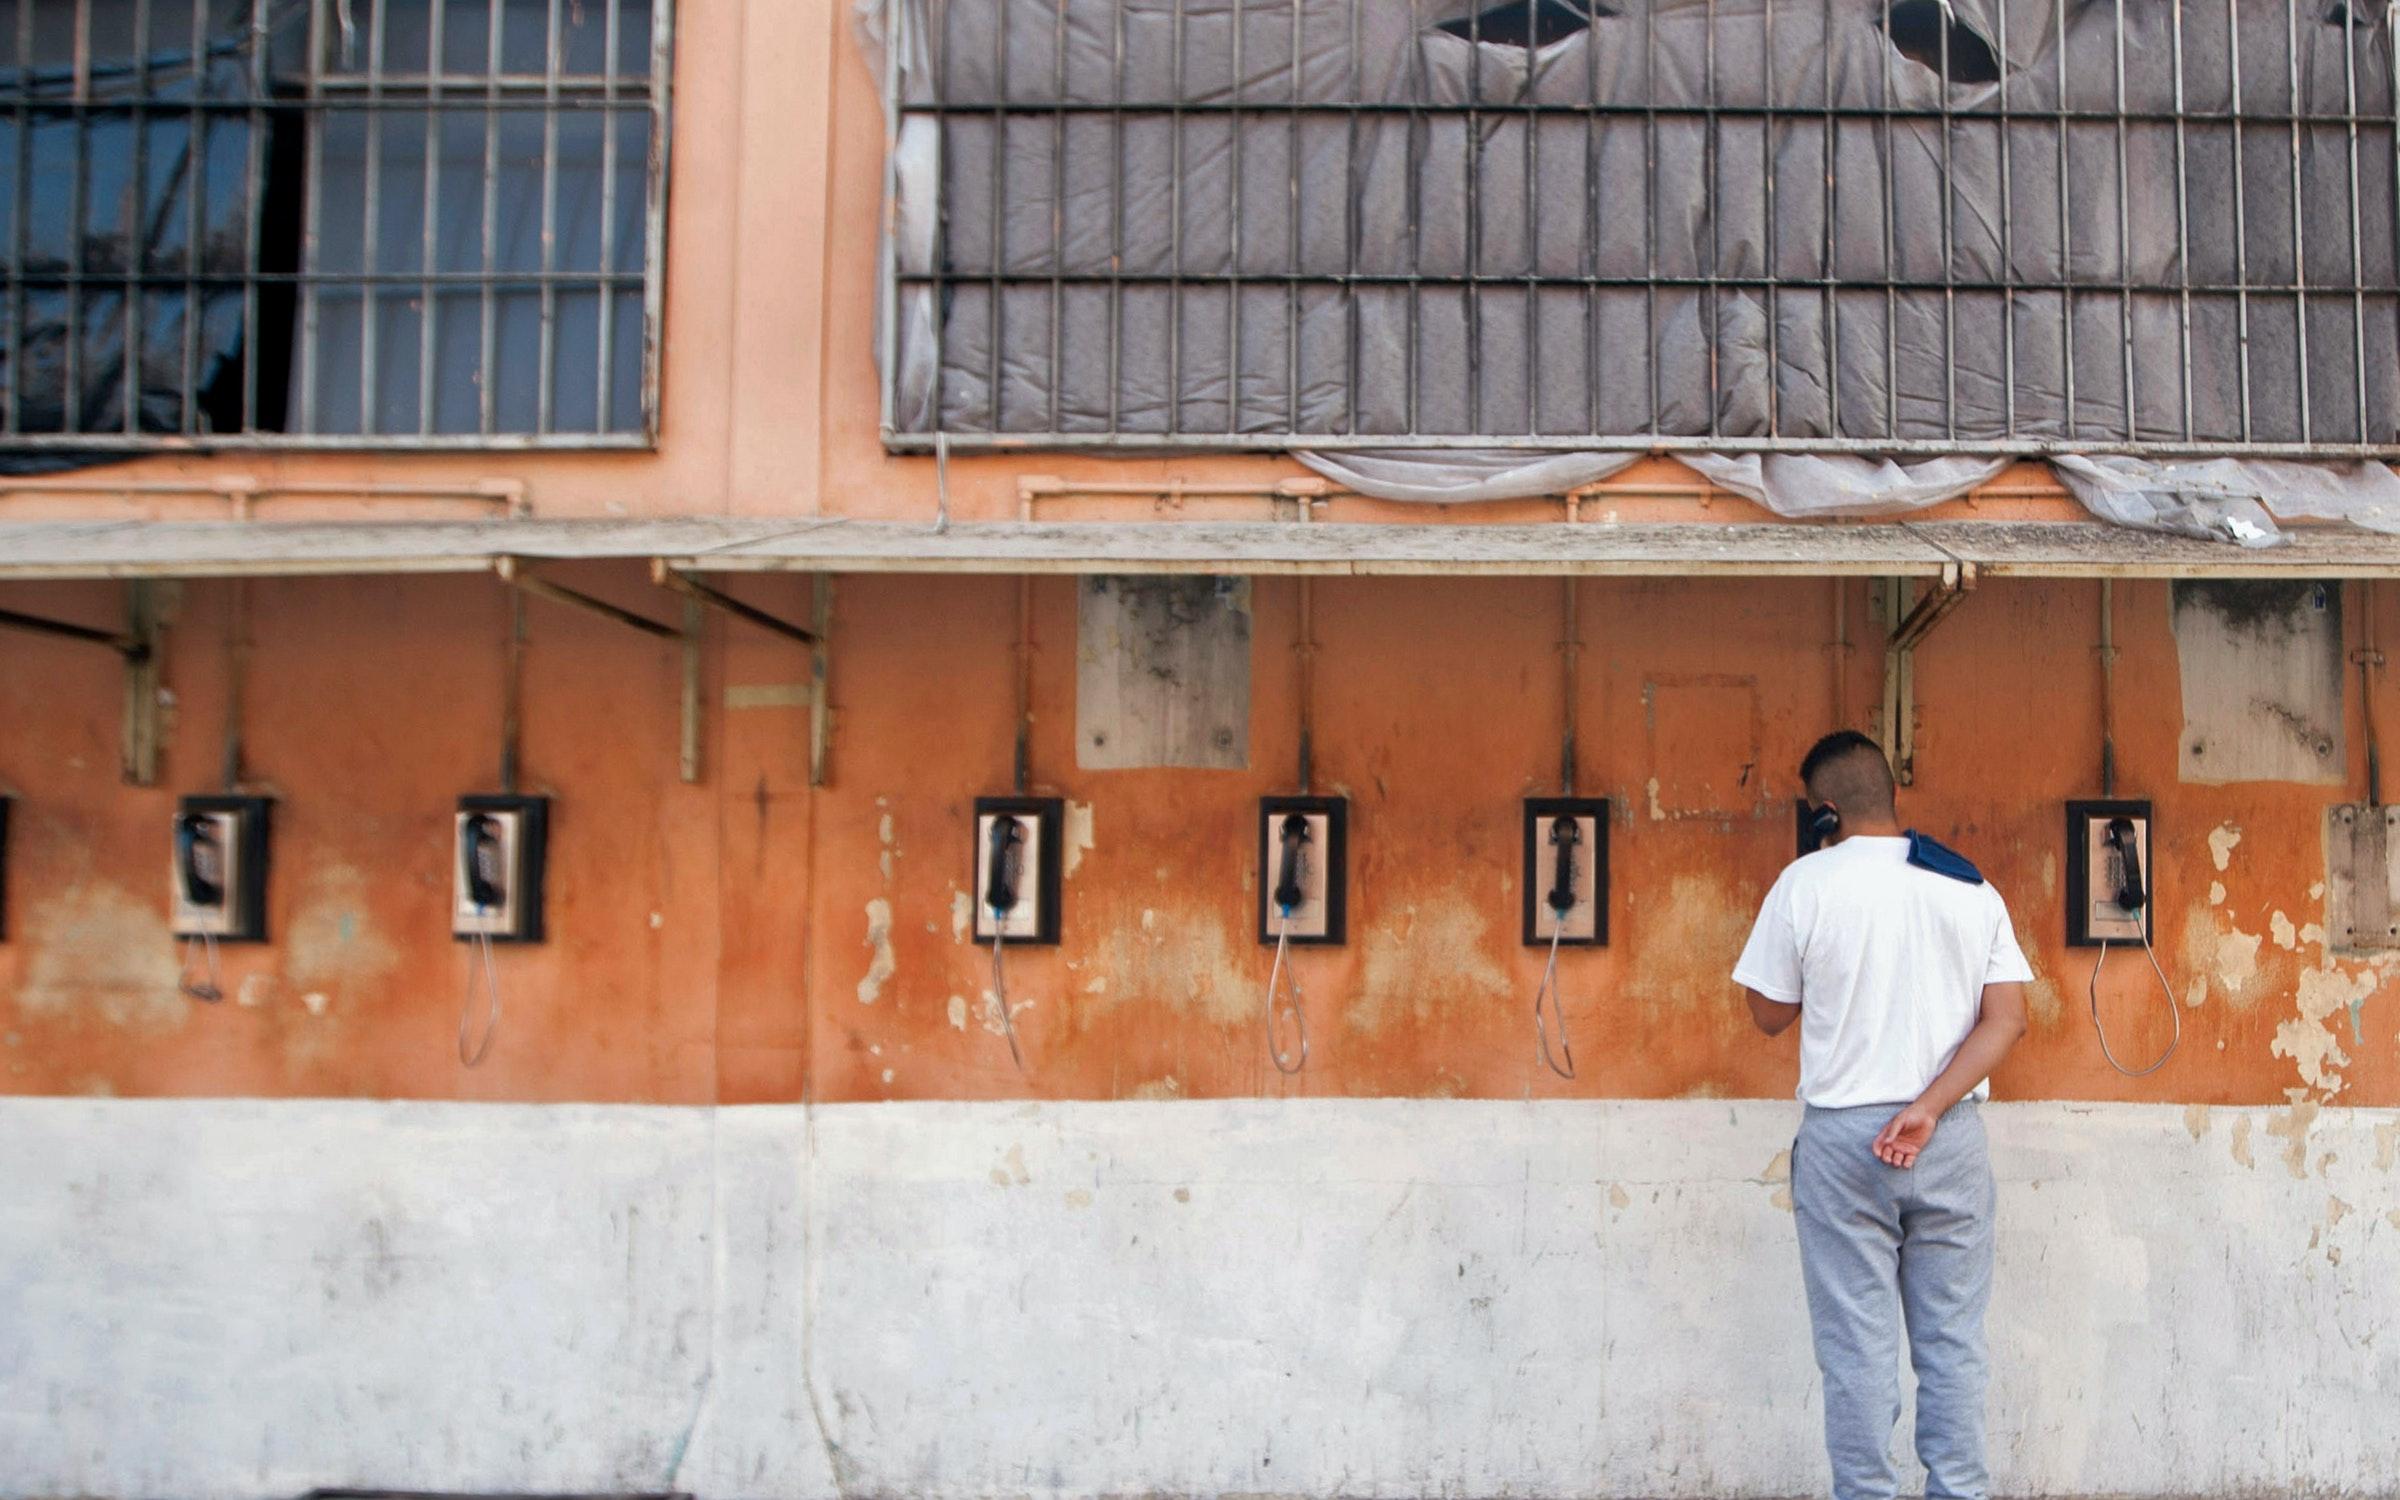 20210223-cesar-mexico-prison-3000